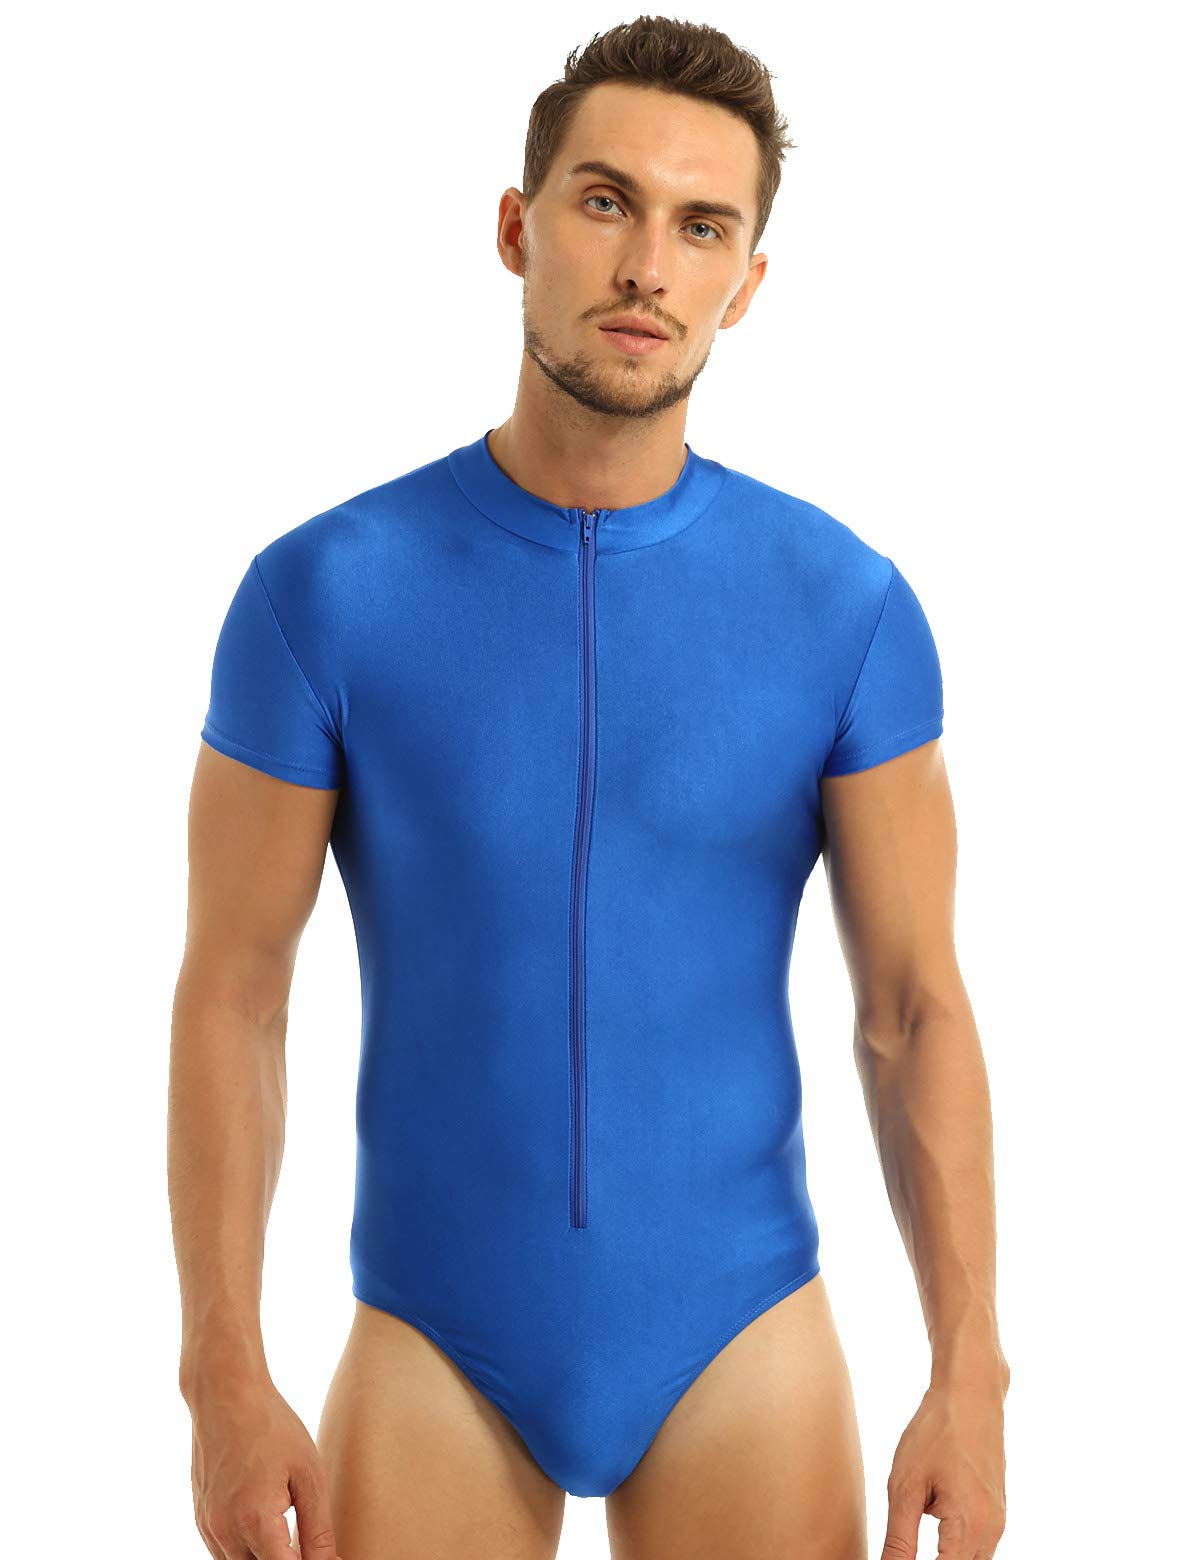 inhzoy Men's Short Sleeve Zipper Front Ballet Dance Leotard One Piece Gymnastics Bodysuit Blue Medium by inhzoy